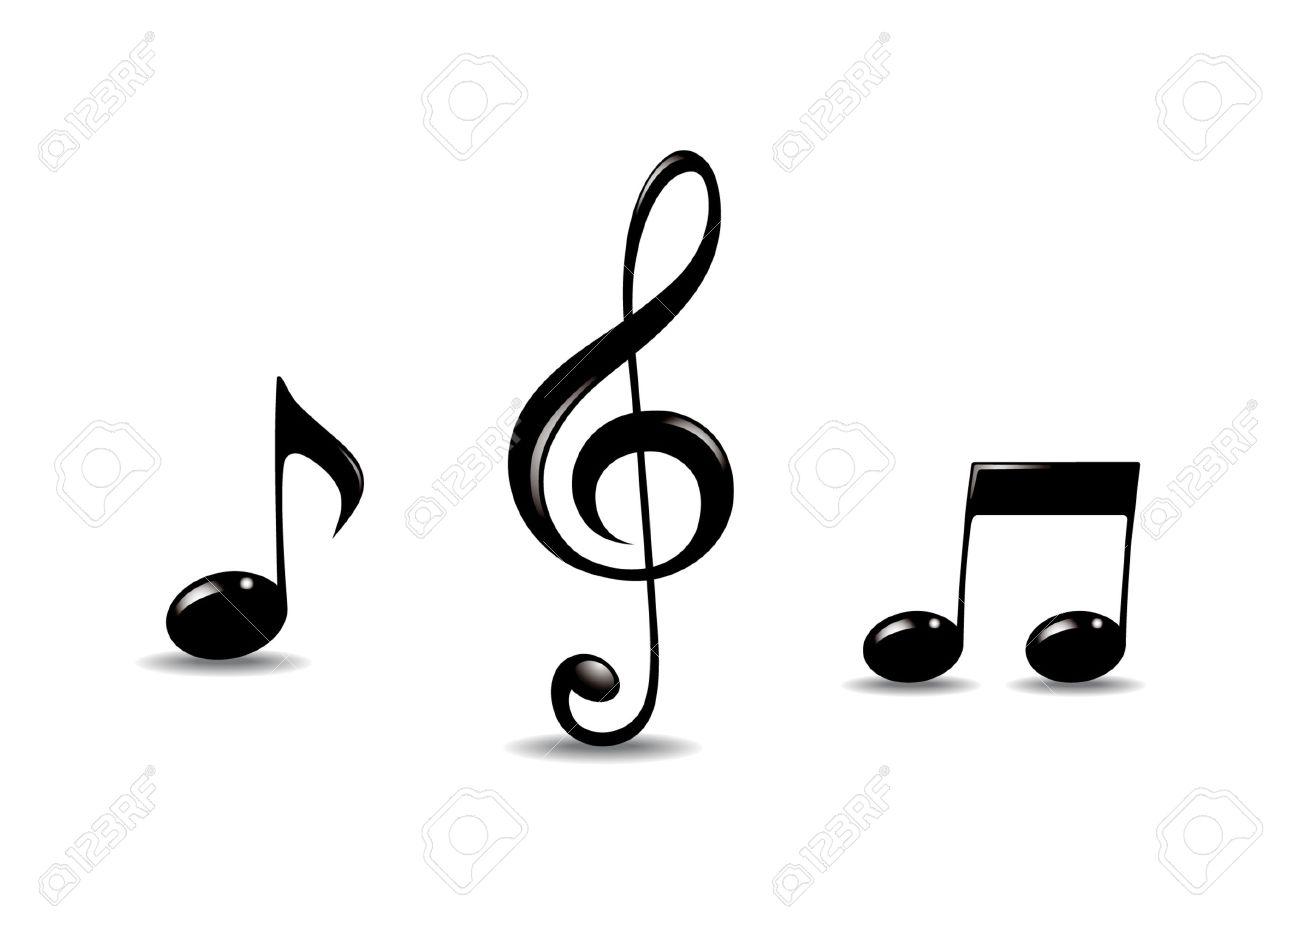 Music symbols royalty free cliparts vectors and stock music symbols stock vector 7949335 buycottarizona Gallery